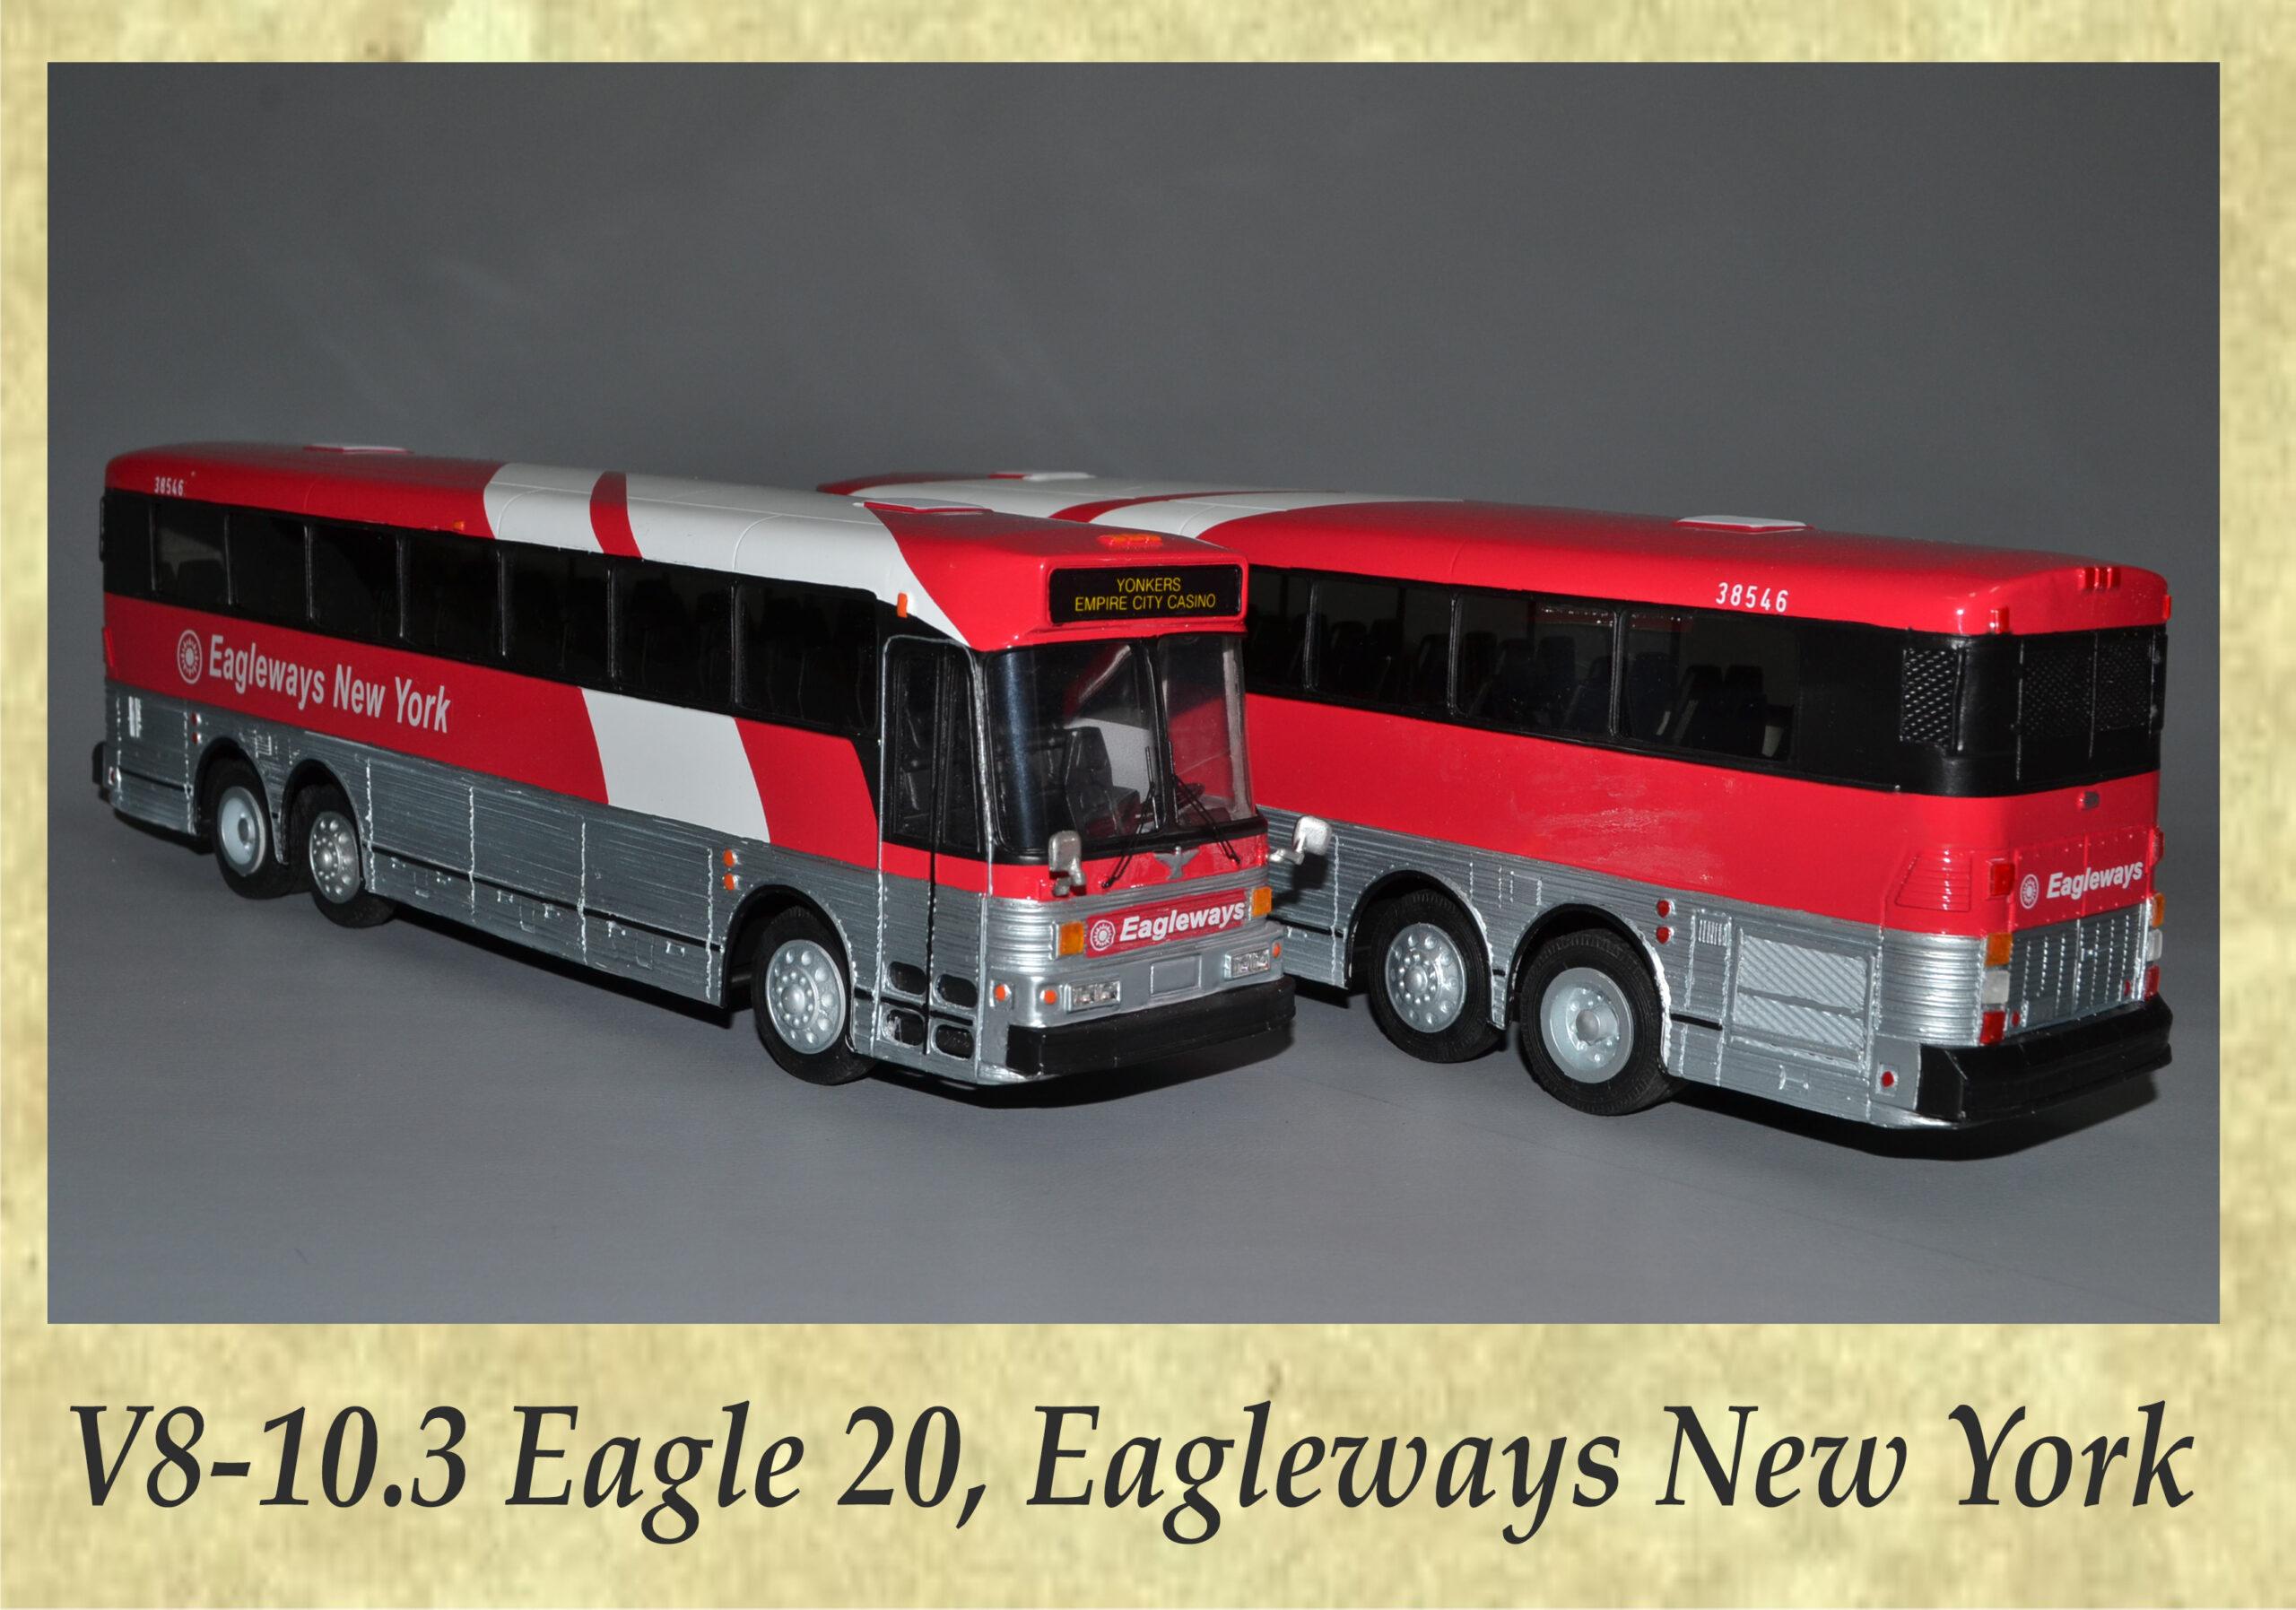 V8-10.3 Eagle 20, Eagleways New York